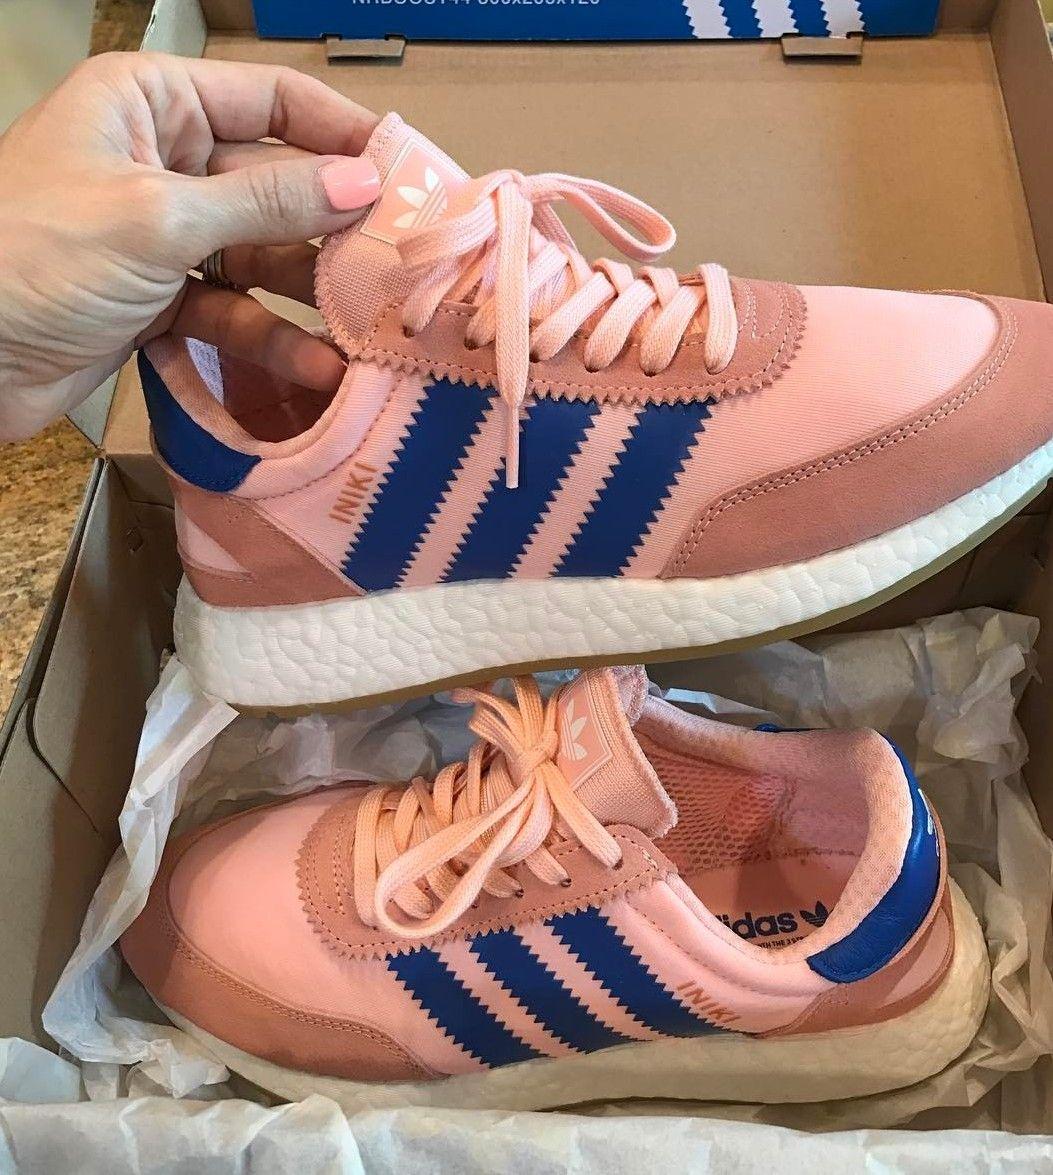 Adidas Originals Iniki In Orange Rosa Blau Orange Blue Foto Amyy Steiner Instagram Turnschuhe Adidas Sneaker Sneaker